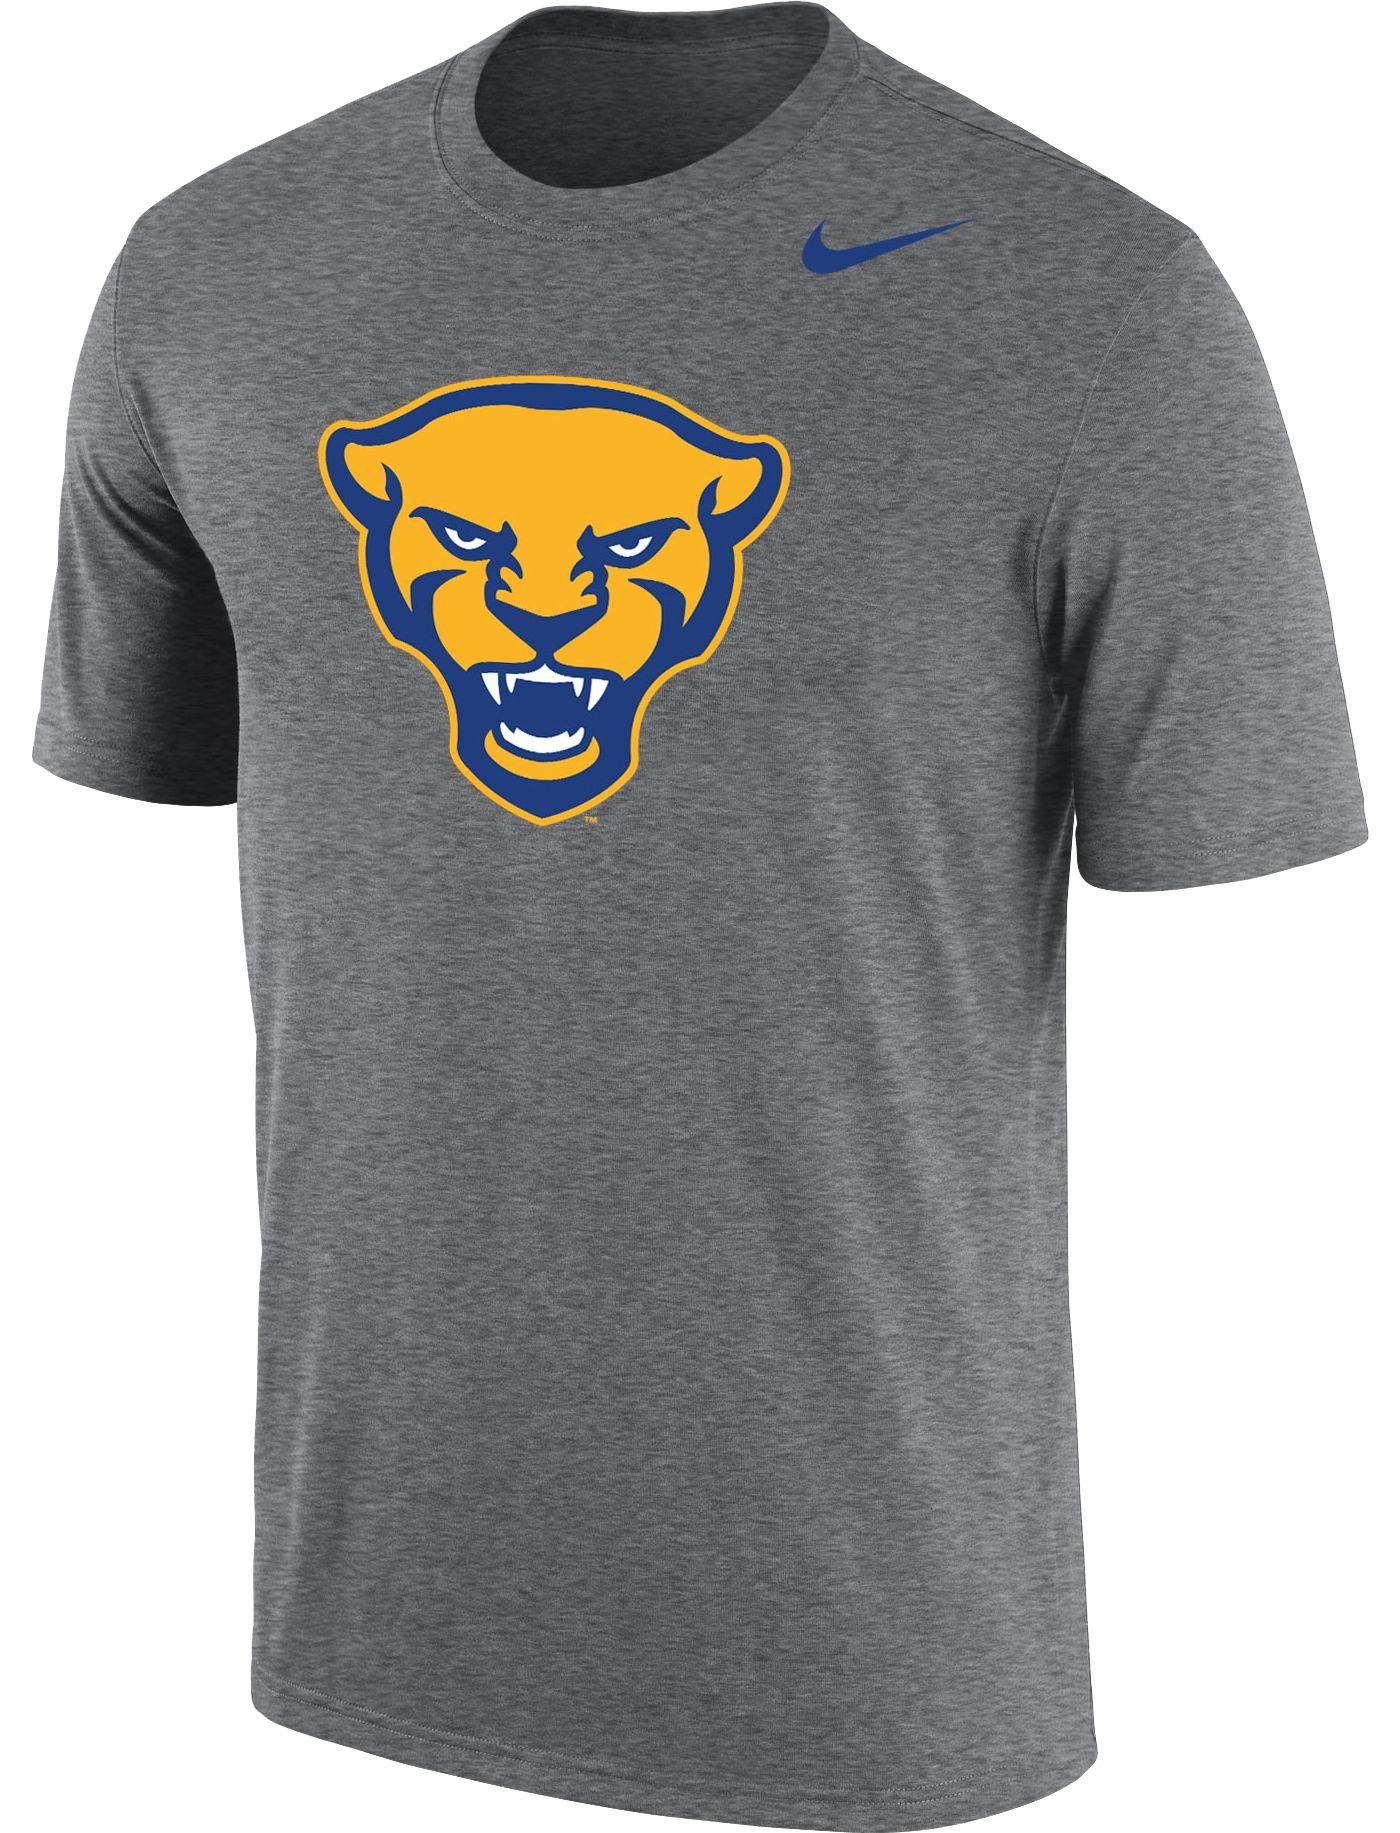 Nike Men's Pitt Panthers Grey Panther Head Logo Dri-FIT Cotton T-Shirt